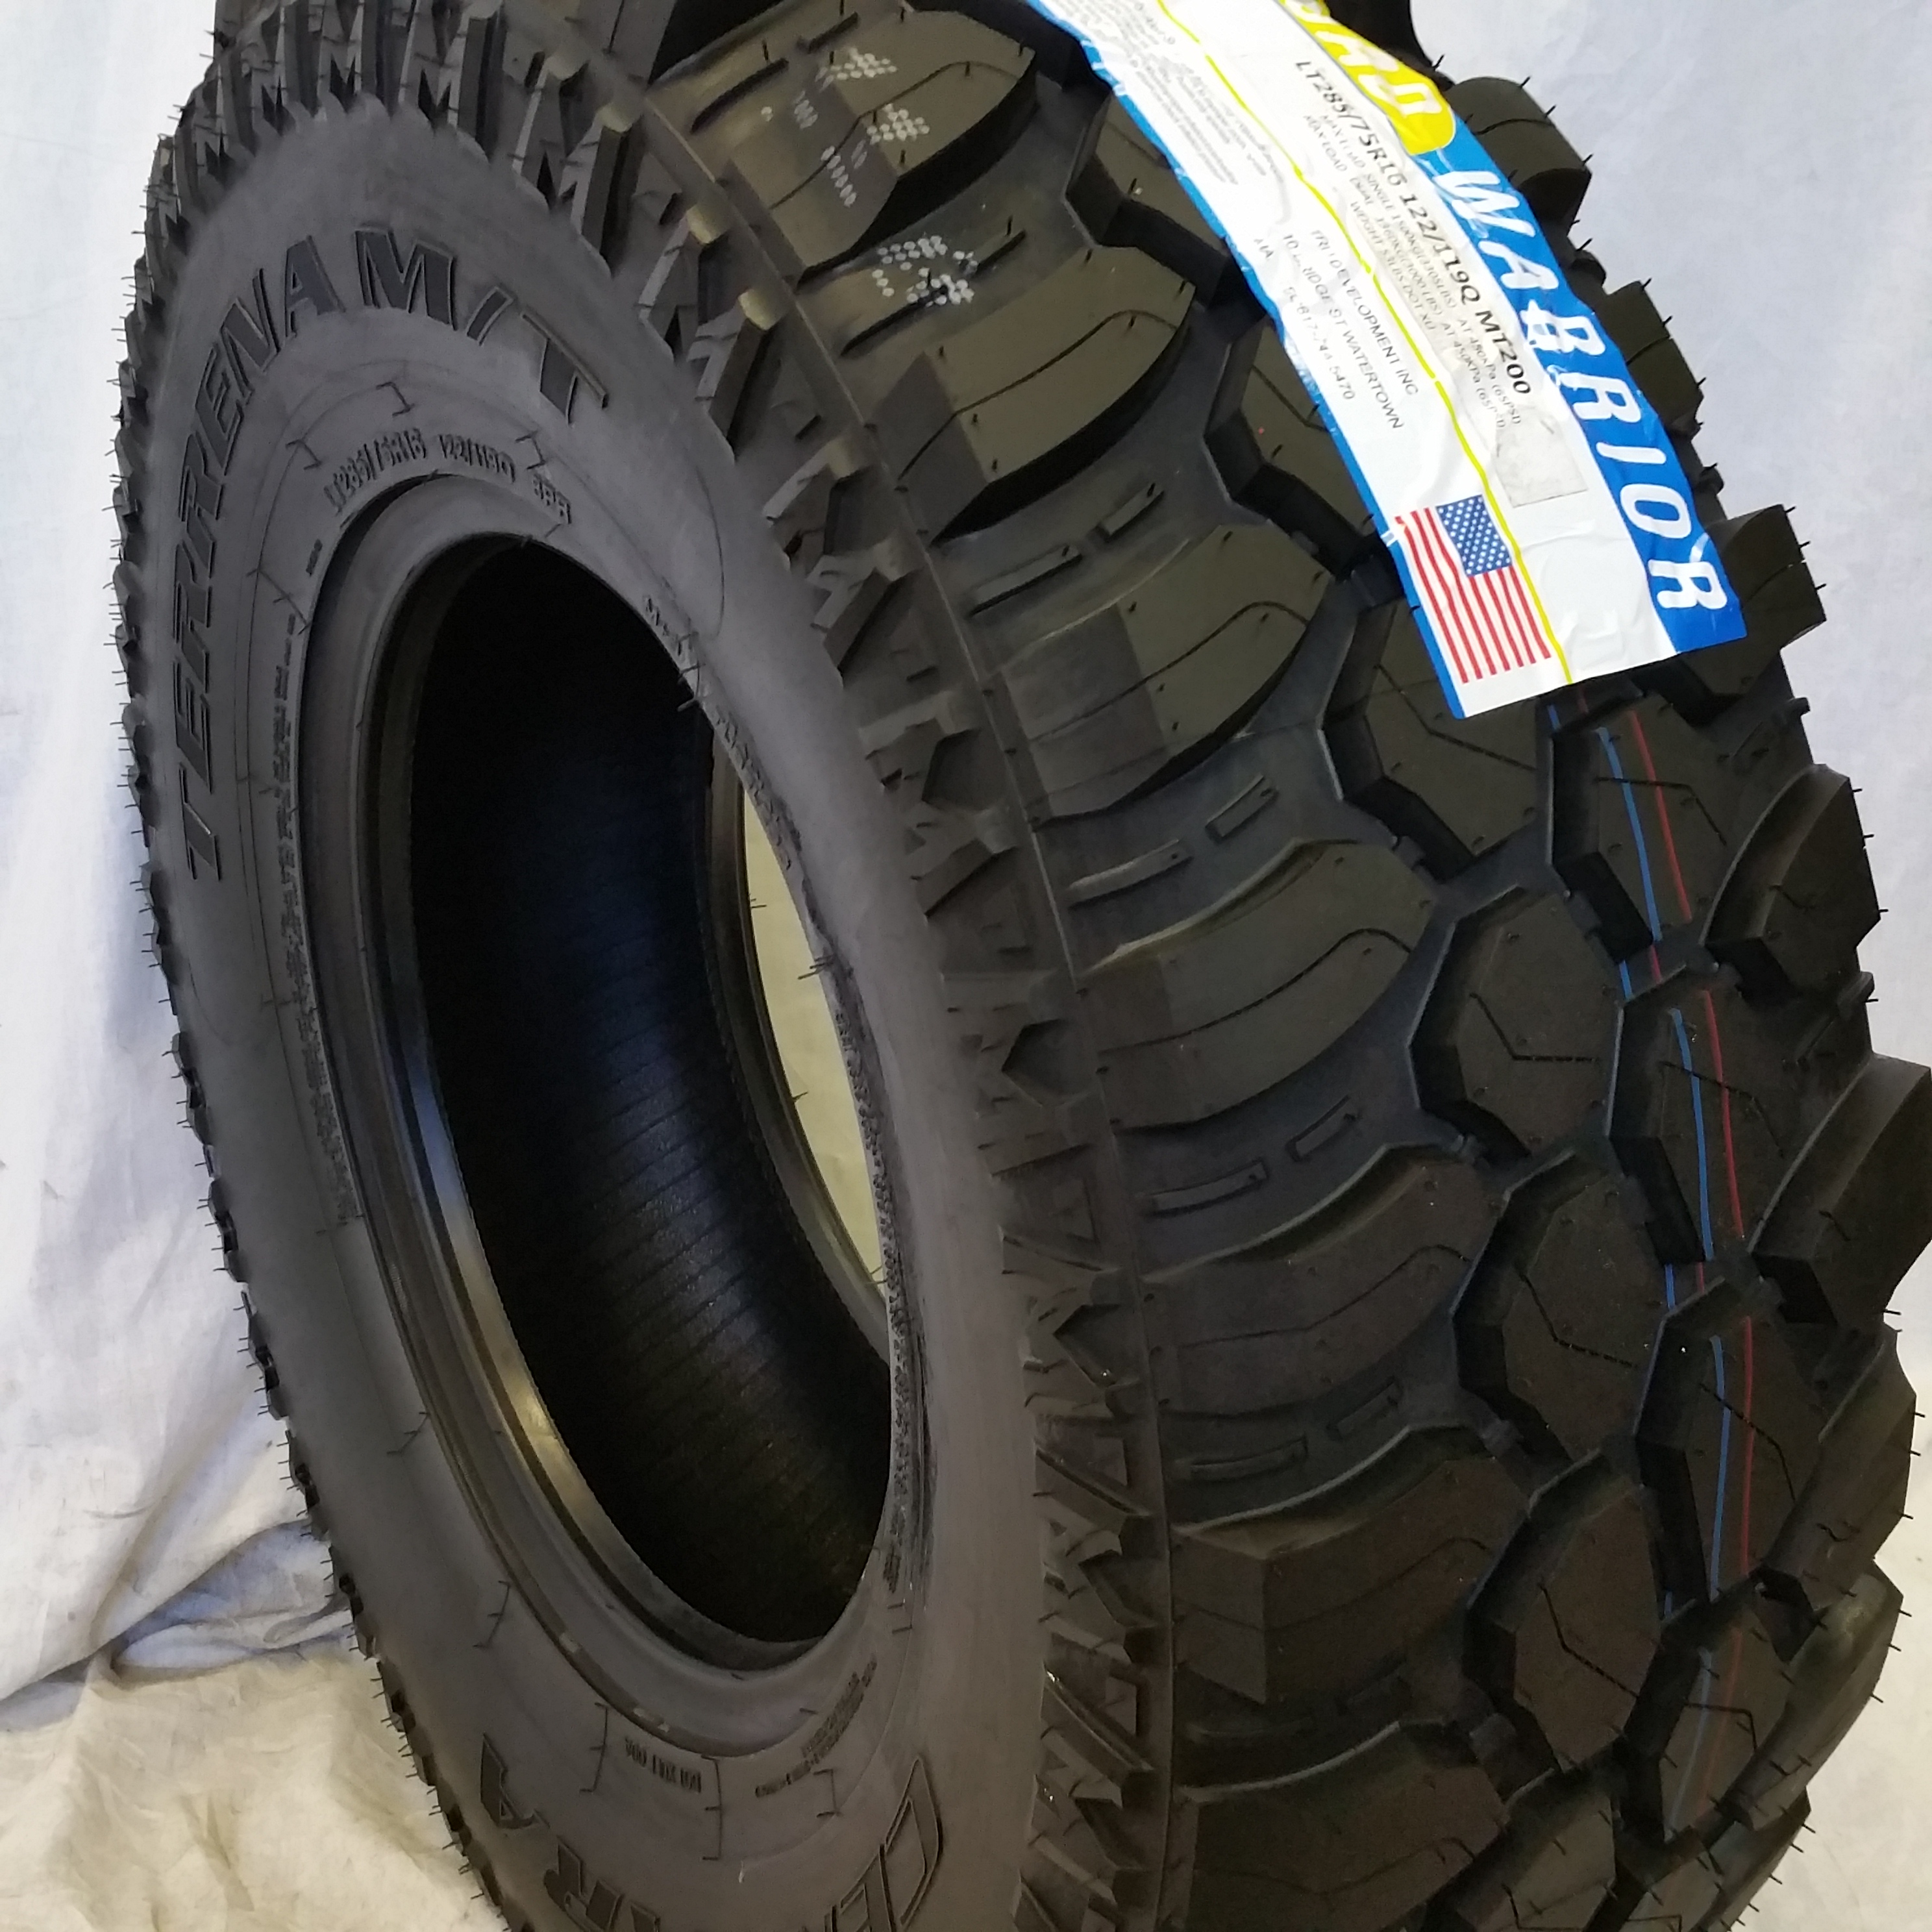 Lt 285 75r16 Road Warrior Lt 285 75r16 Mt Mud Trrain Truck Tires Inc